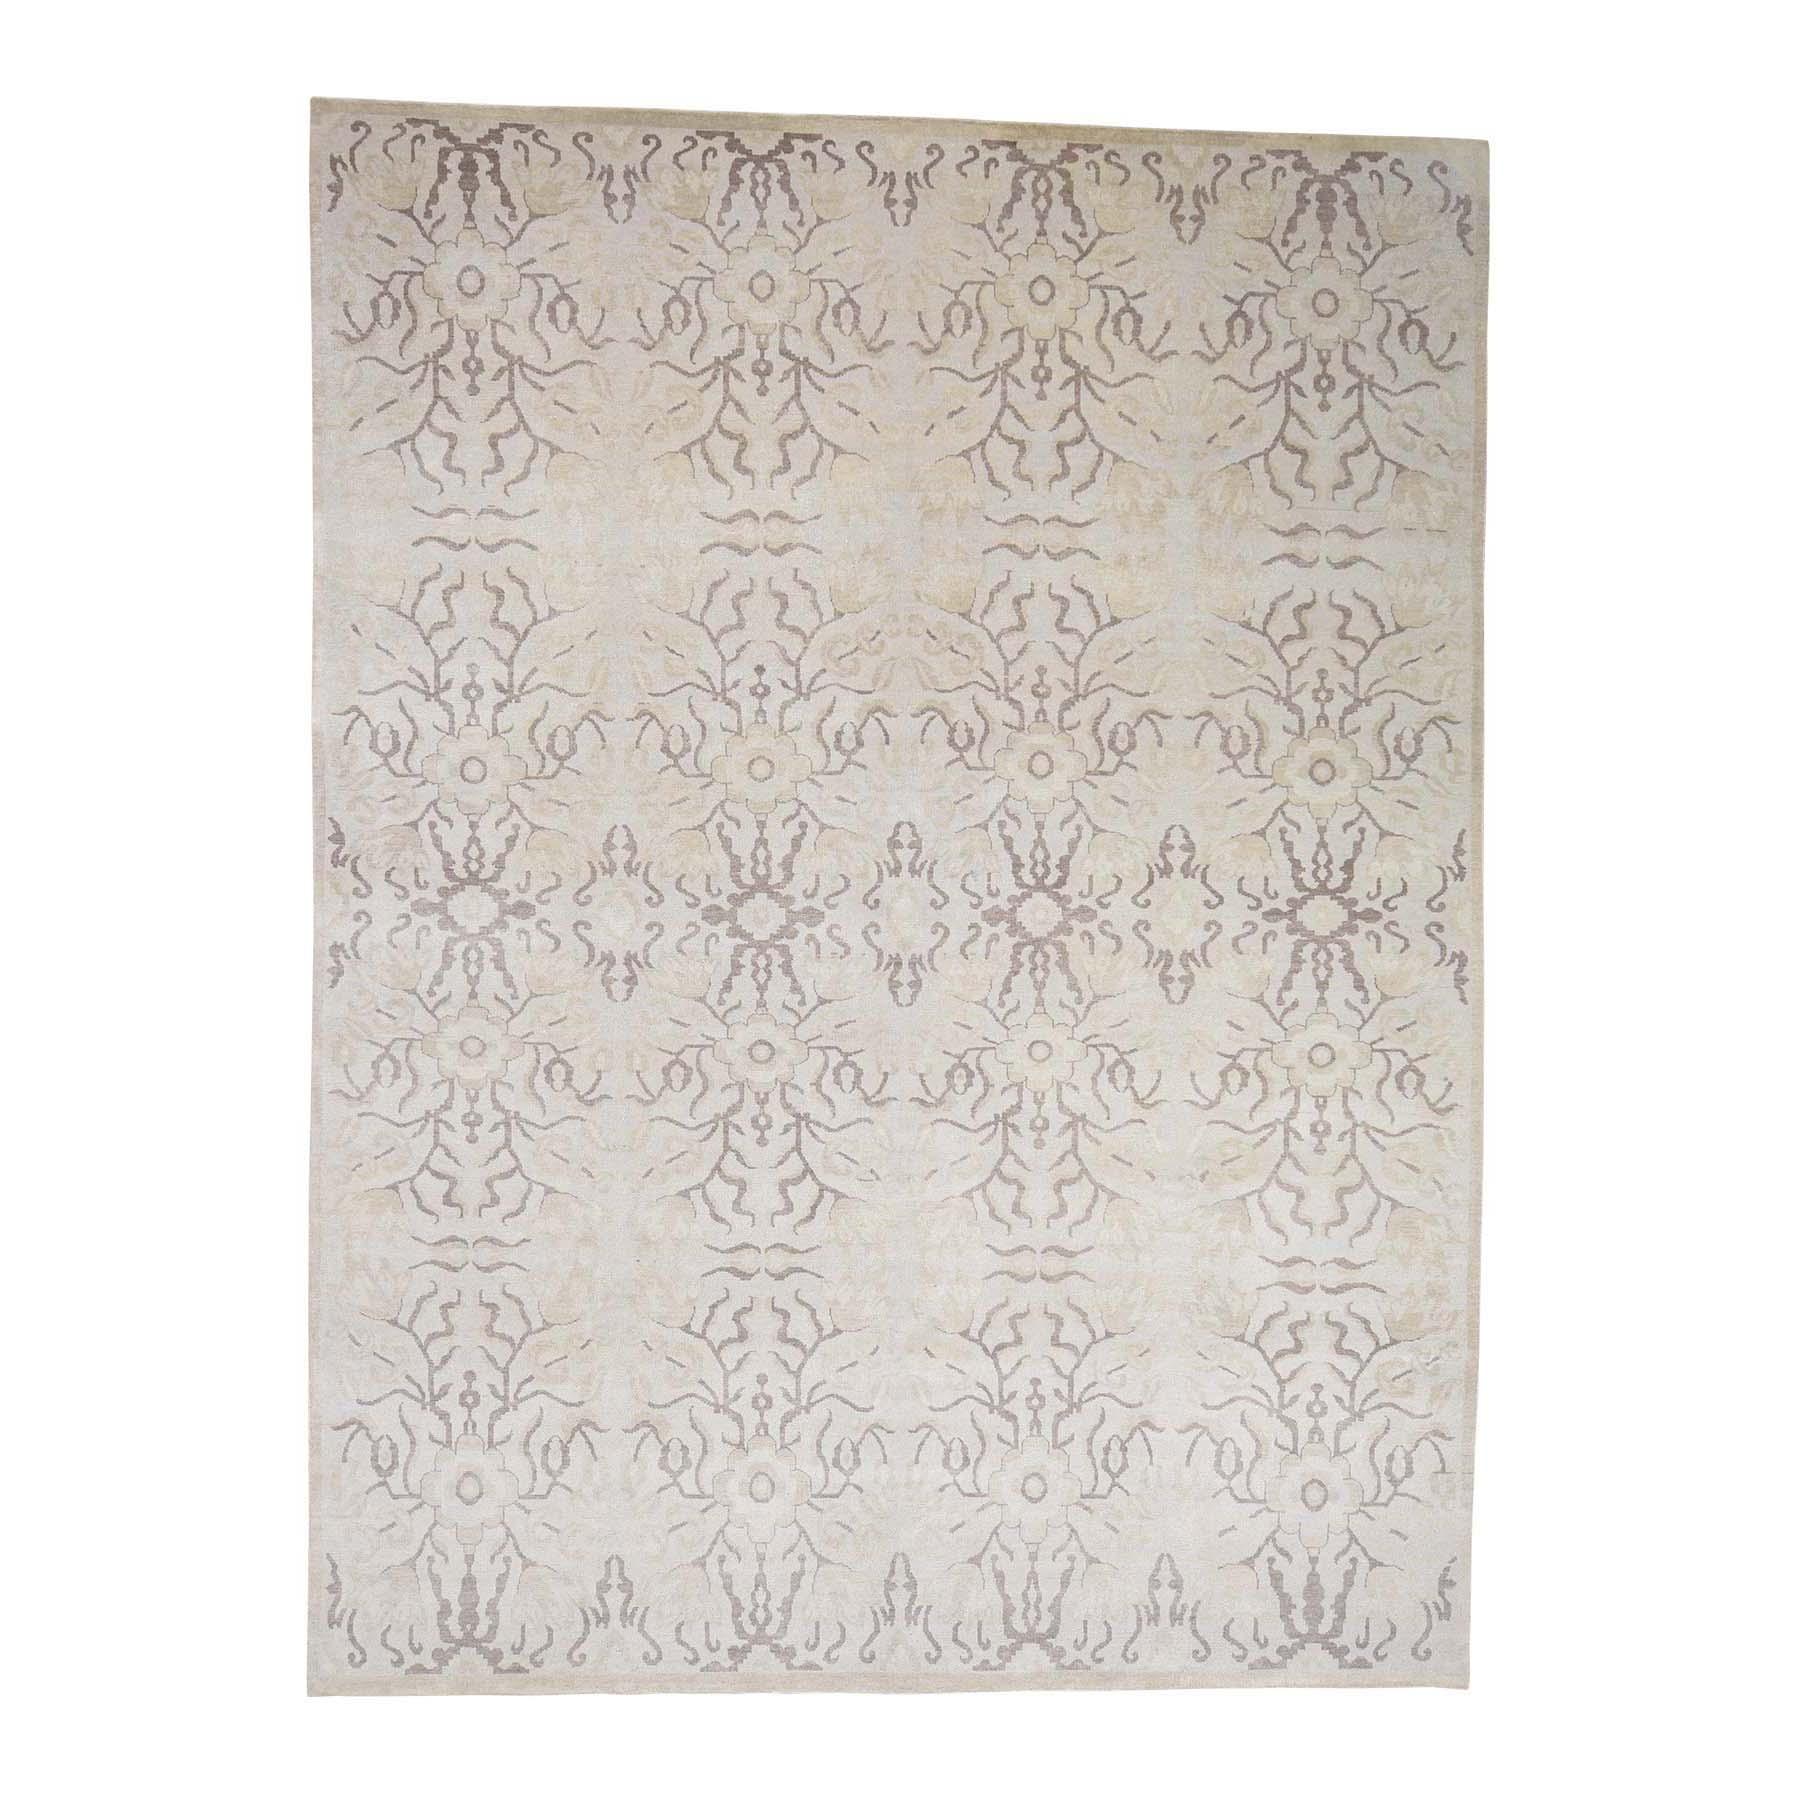 9'X12' Hand Knotted Pure Wool Nepali Tone On Tone Tibetan Oriental Rug moac9c7d